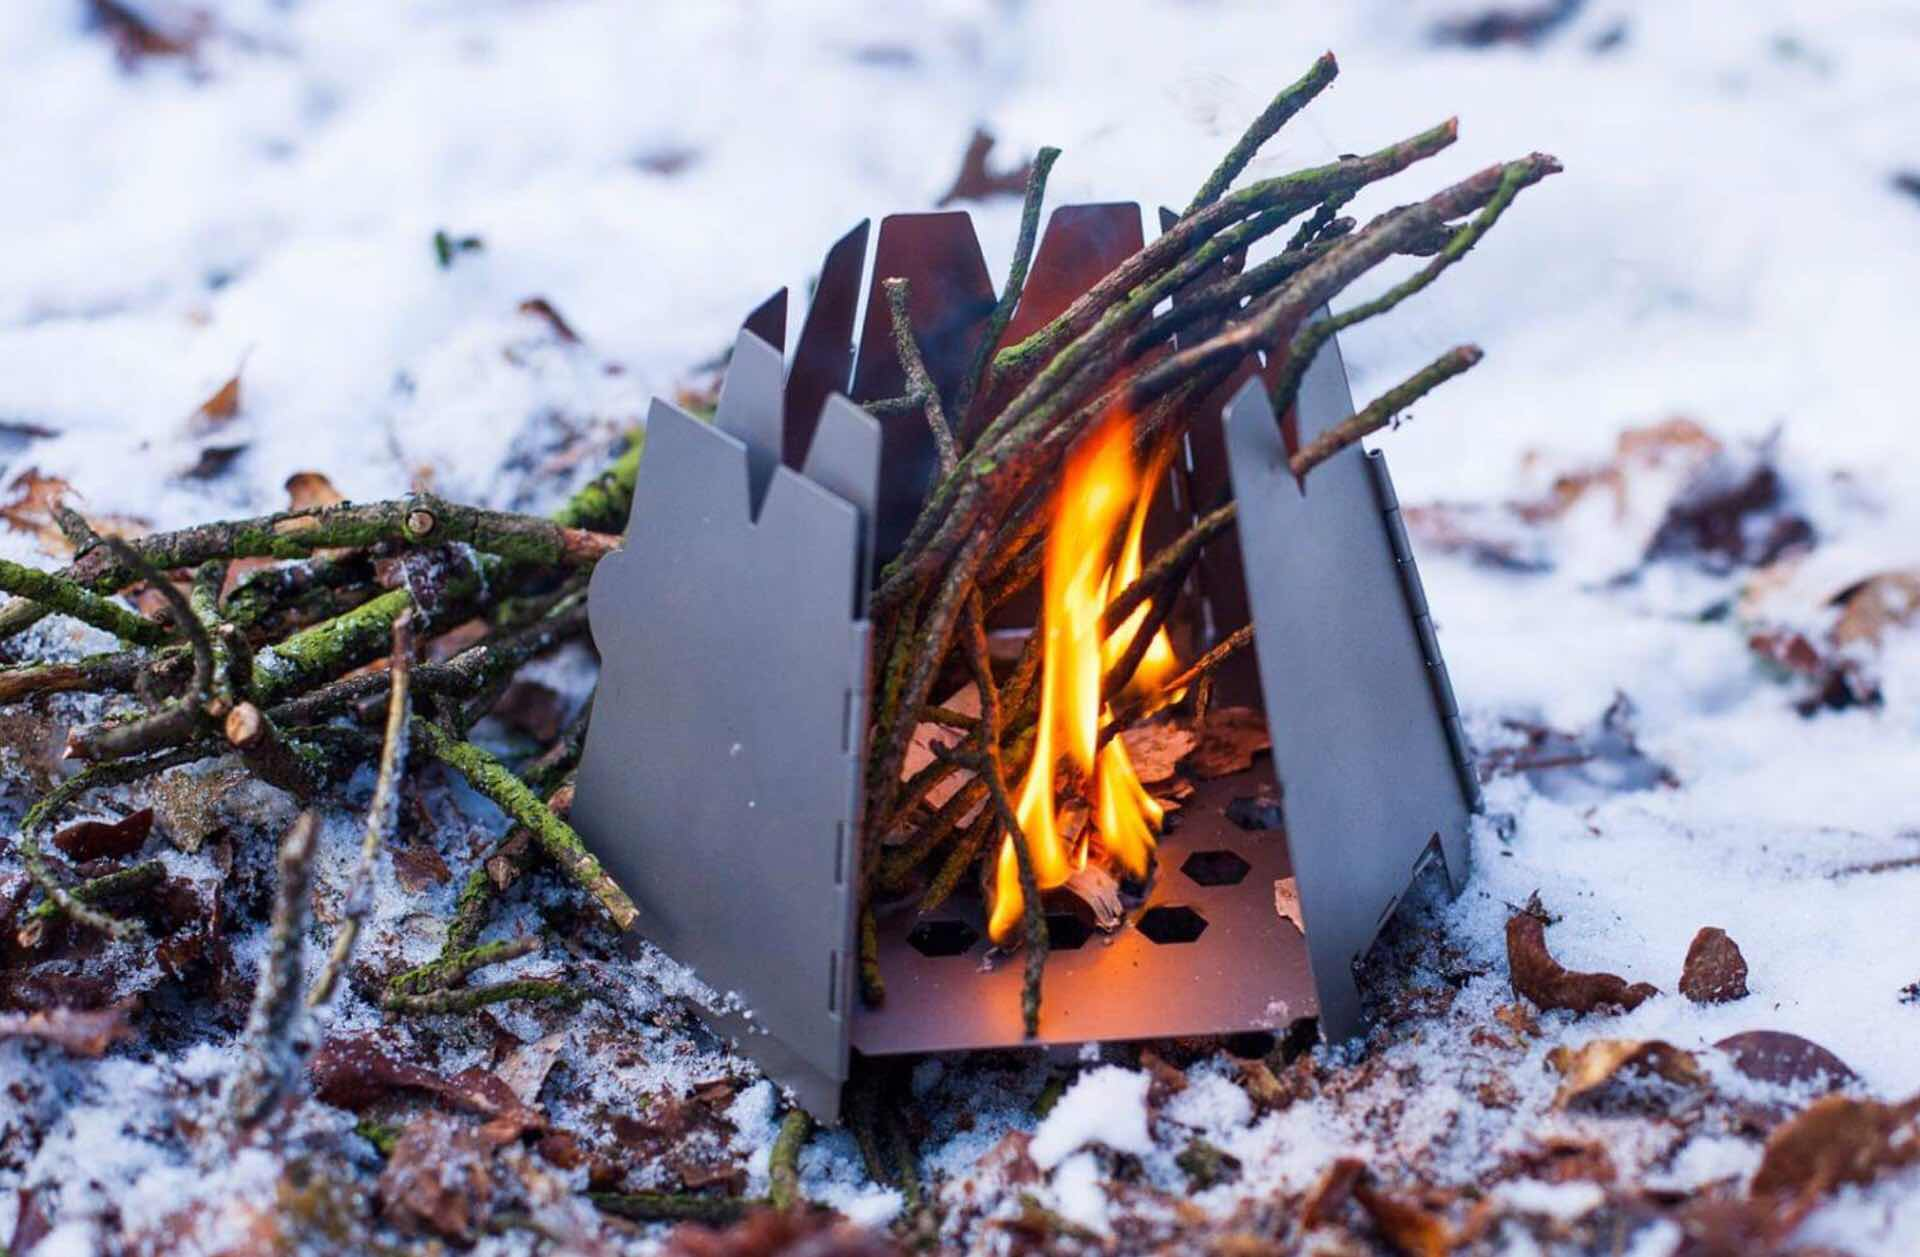 vargo-titanium-hexagon-wood-stove